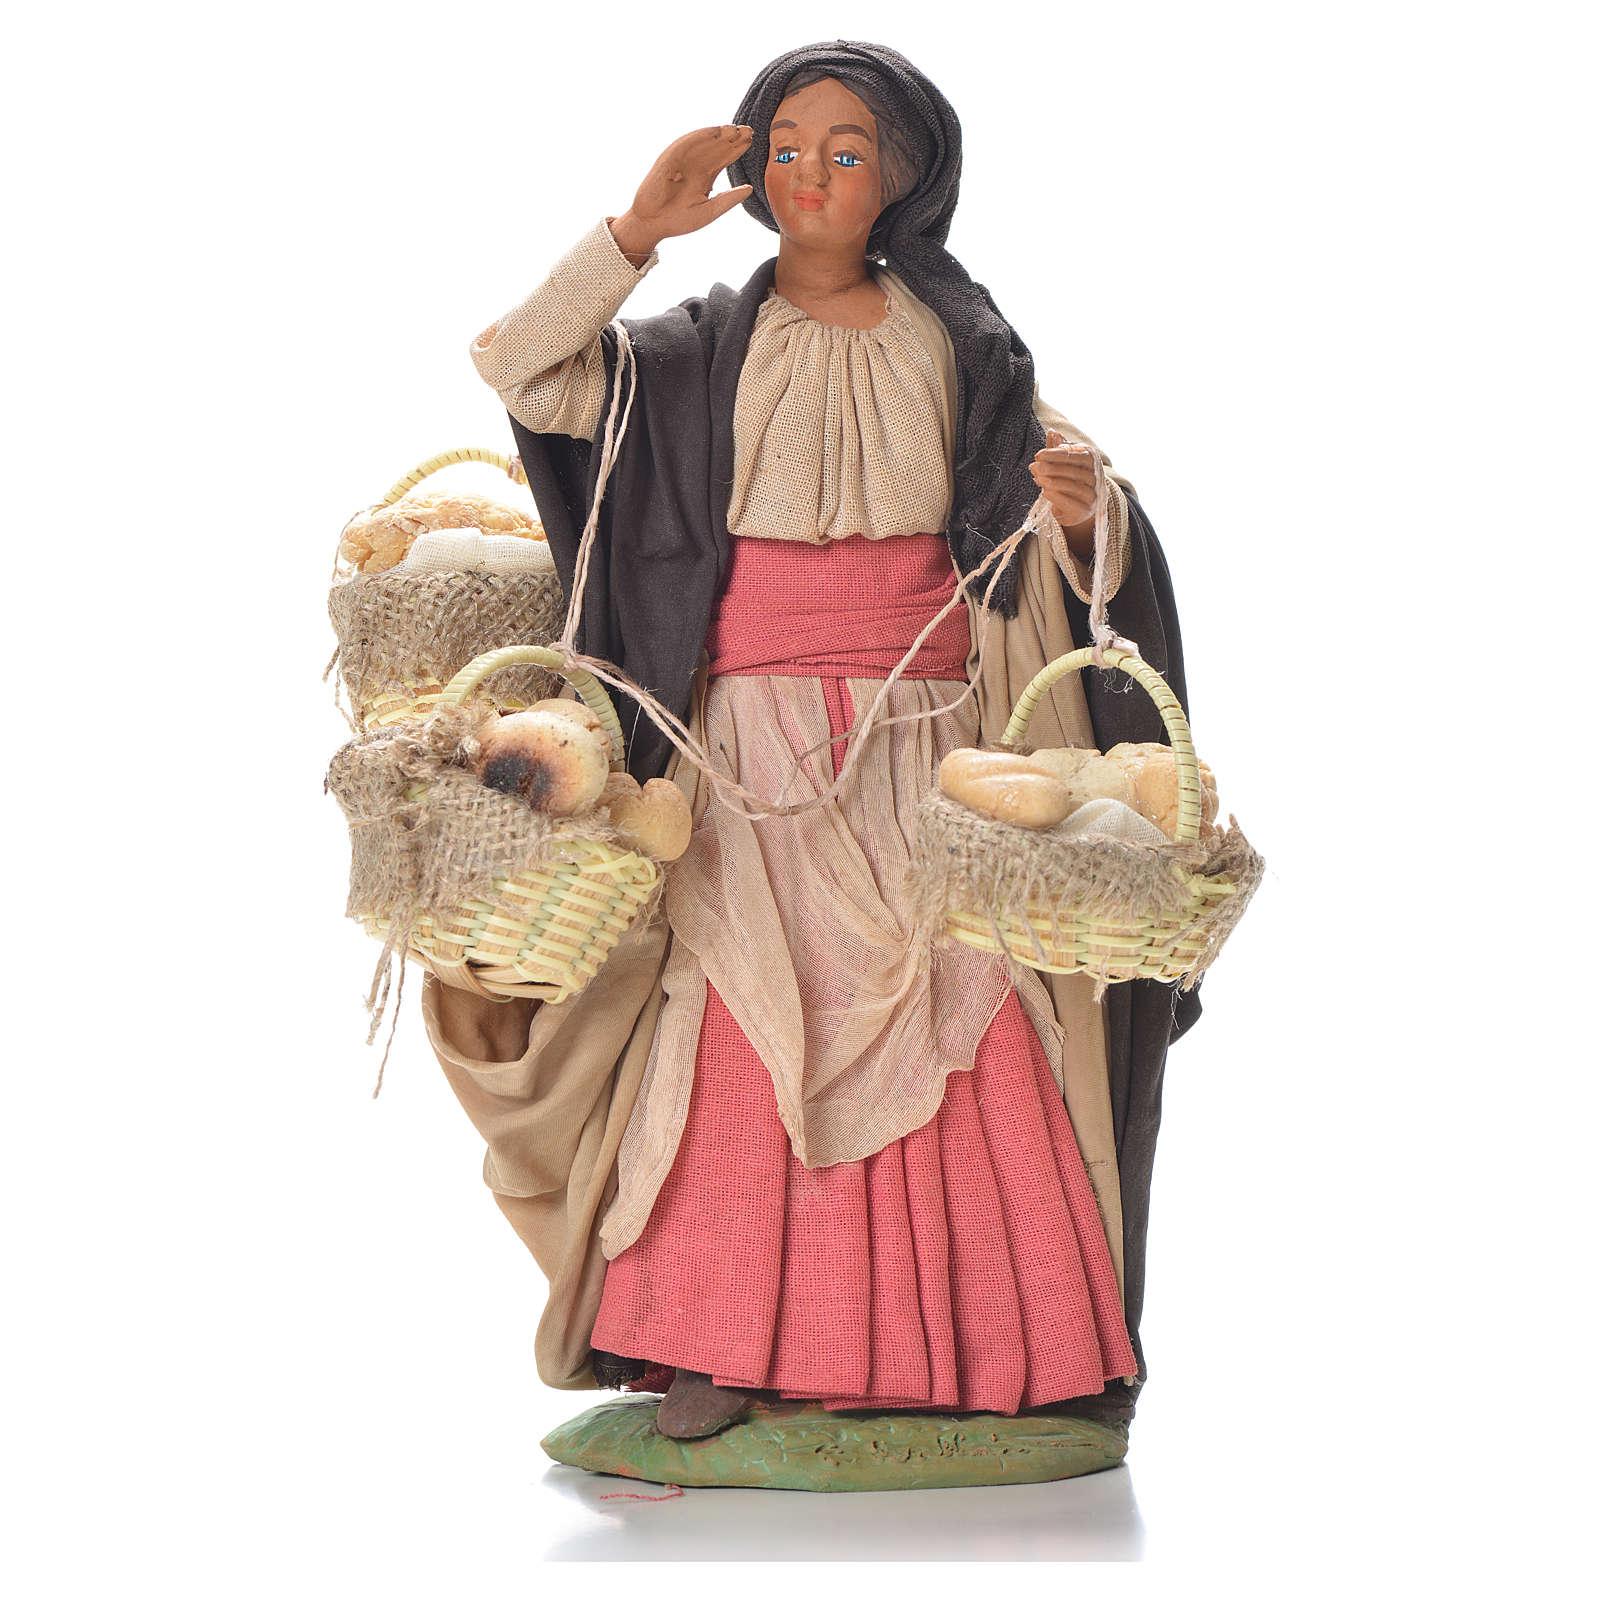 Woman with bread baskets, Neapolitan Nativity 24cm 4